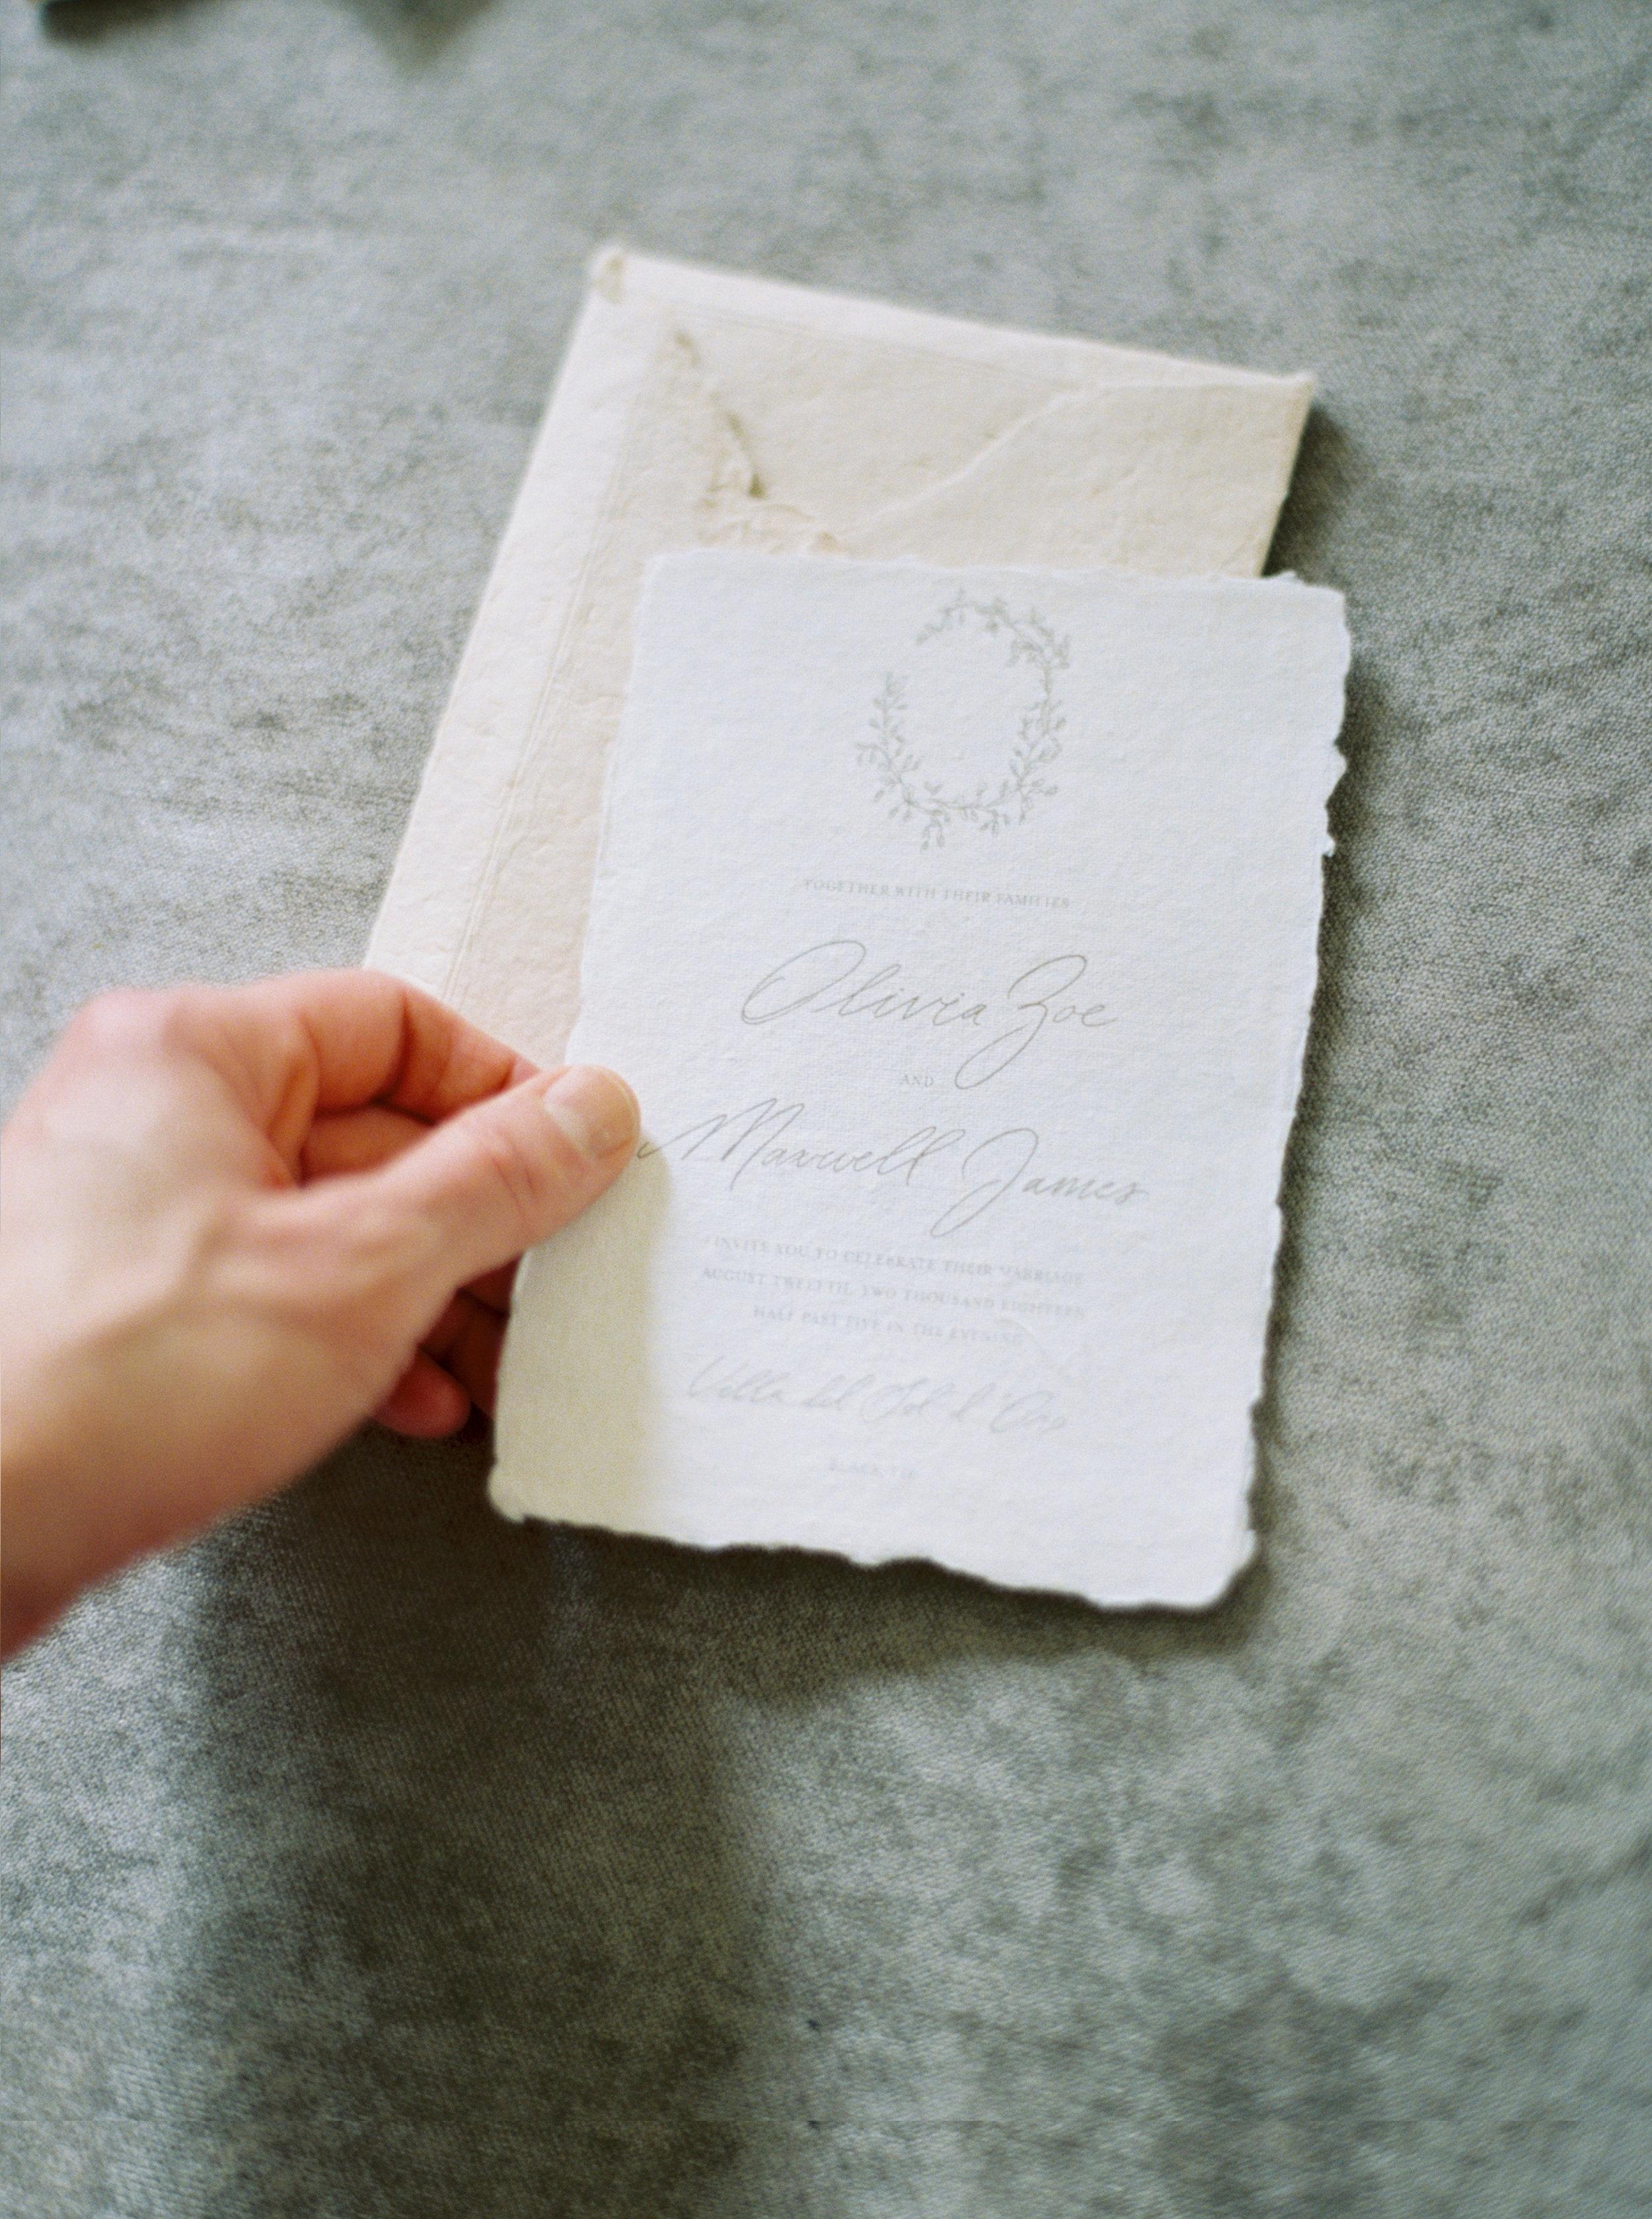 ink&pressco-mikylamanu-wedding-calligraphy-1-unearthing.tc.jpg